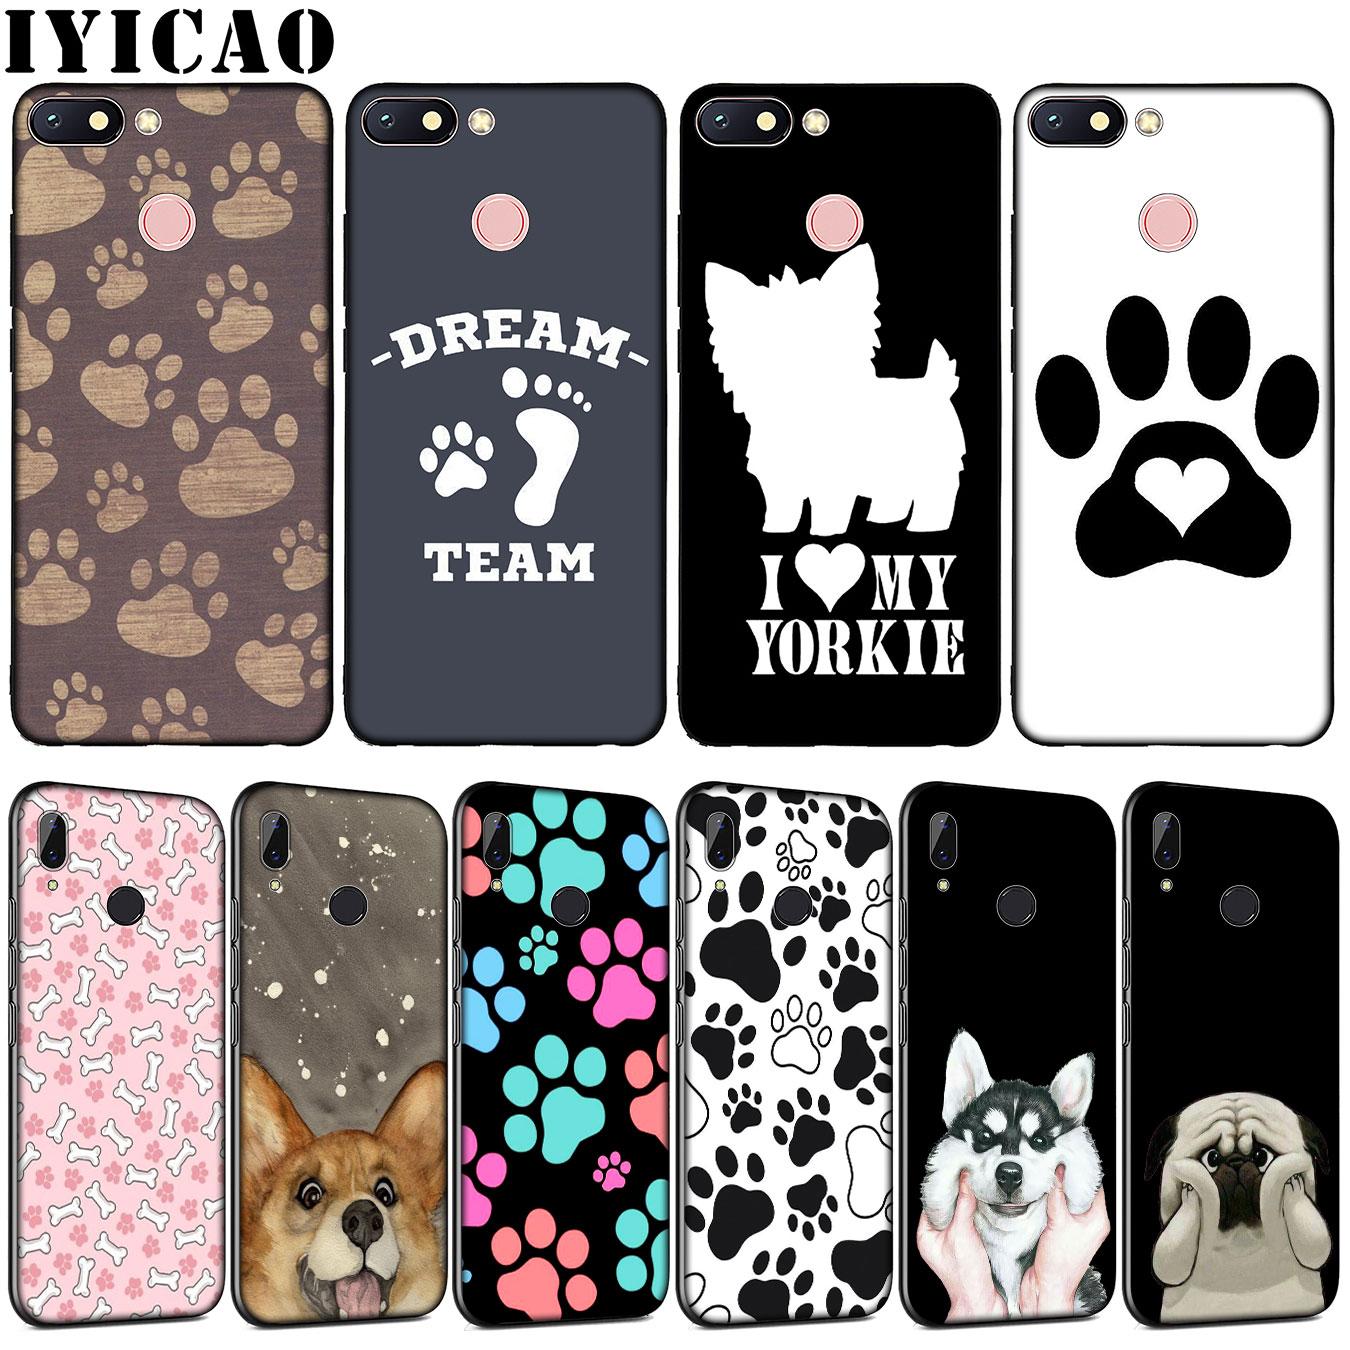 Dog Footprint Paw Cat Soft TPU Silicone Phone Case For Xiaomi Redmi Note 8 8A 8T 7 7A 6 6A 5 5A GO S2 K30 K20 Pro